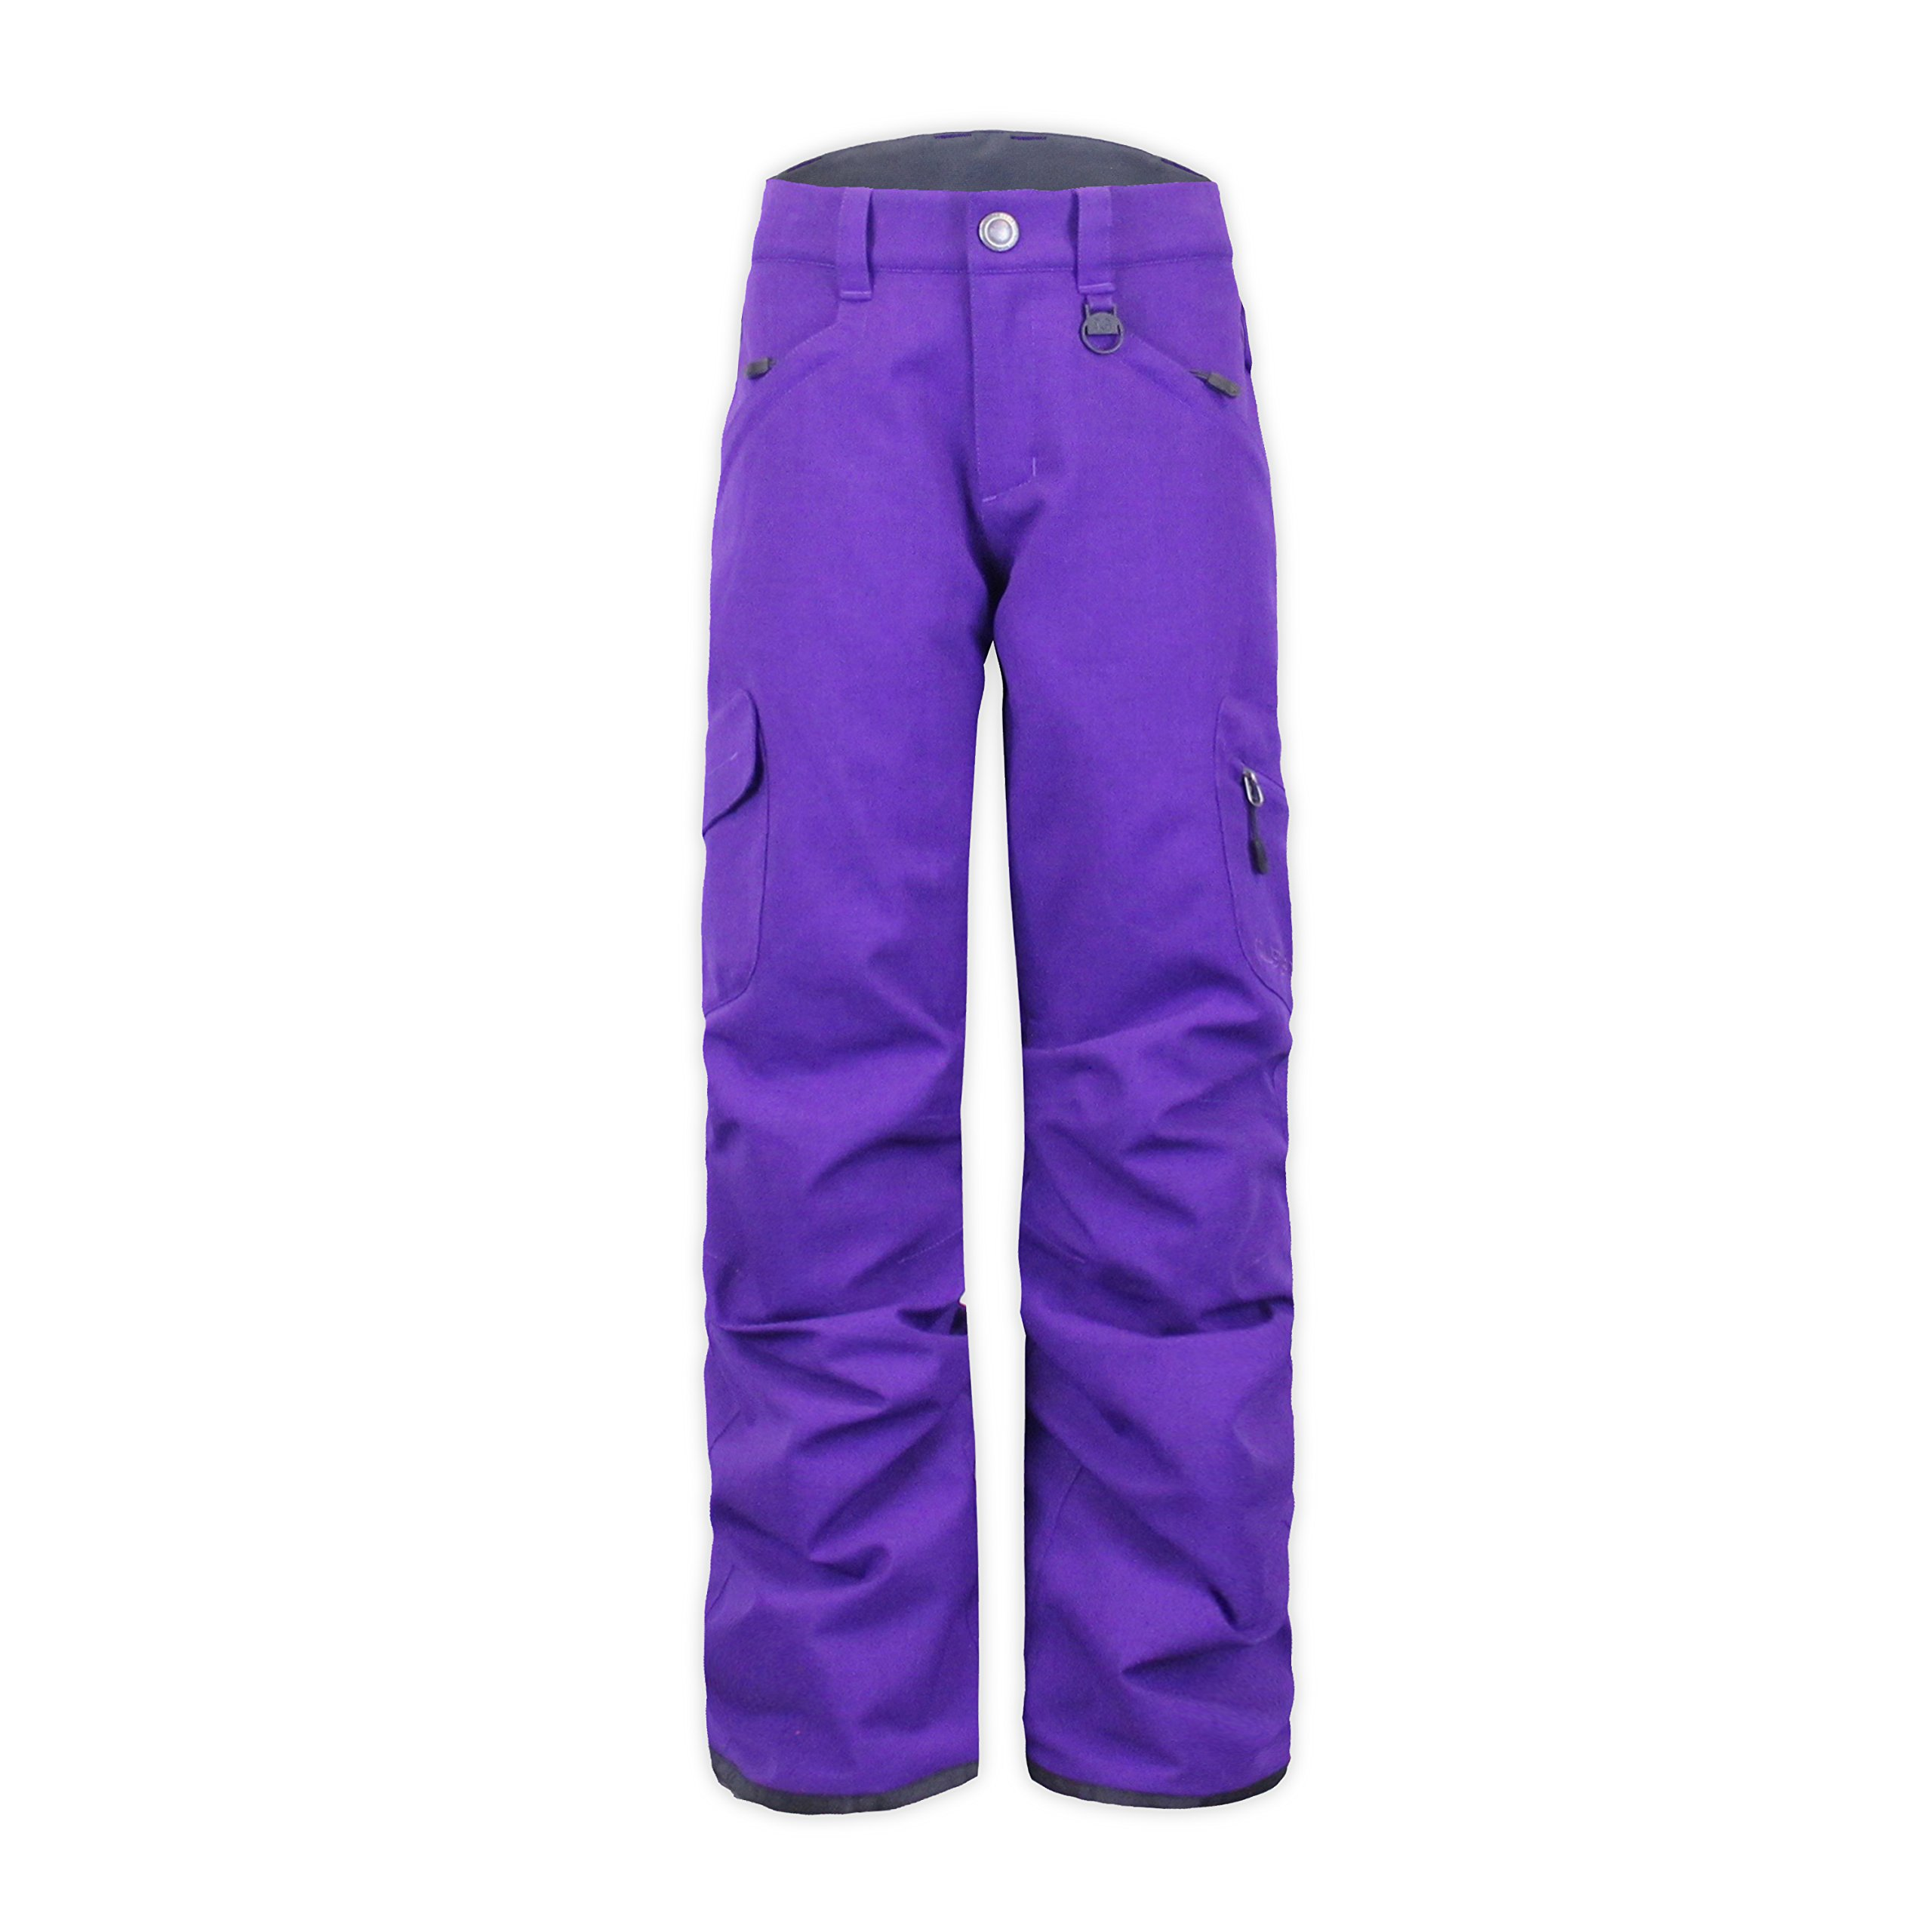 Boulder Gear 8915R Youth Girls Ravish Pant, Eggplant - XL